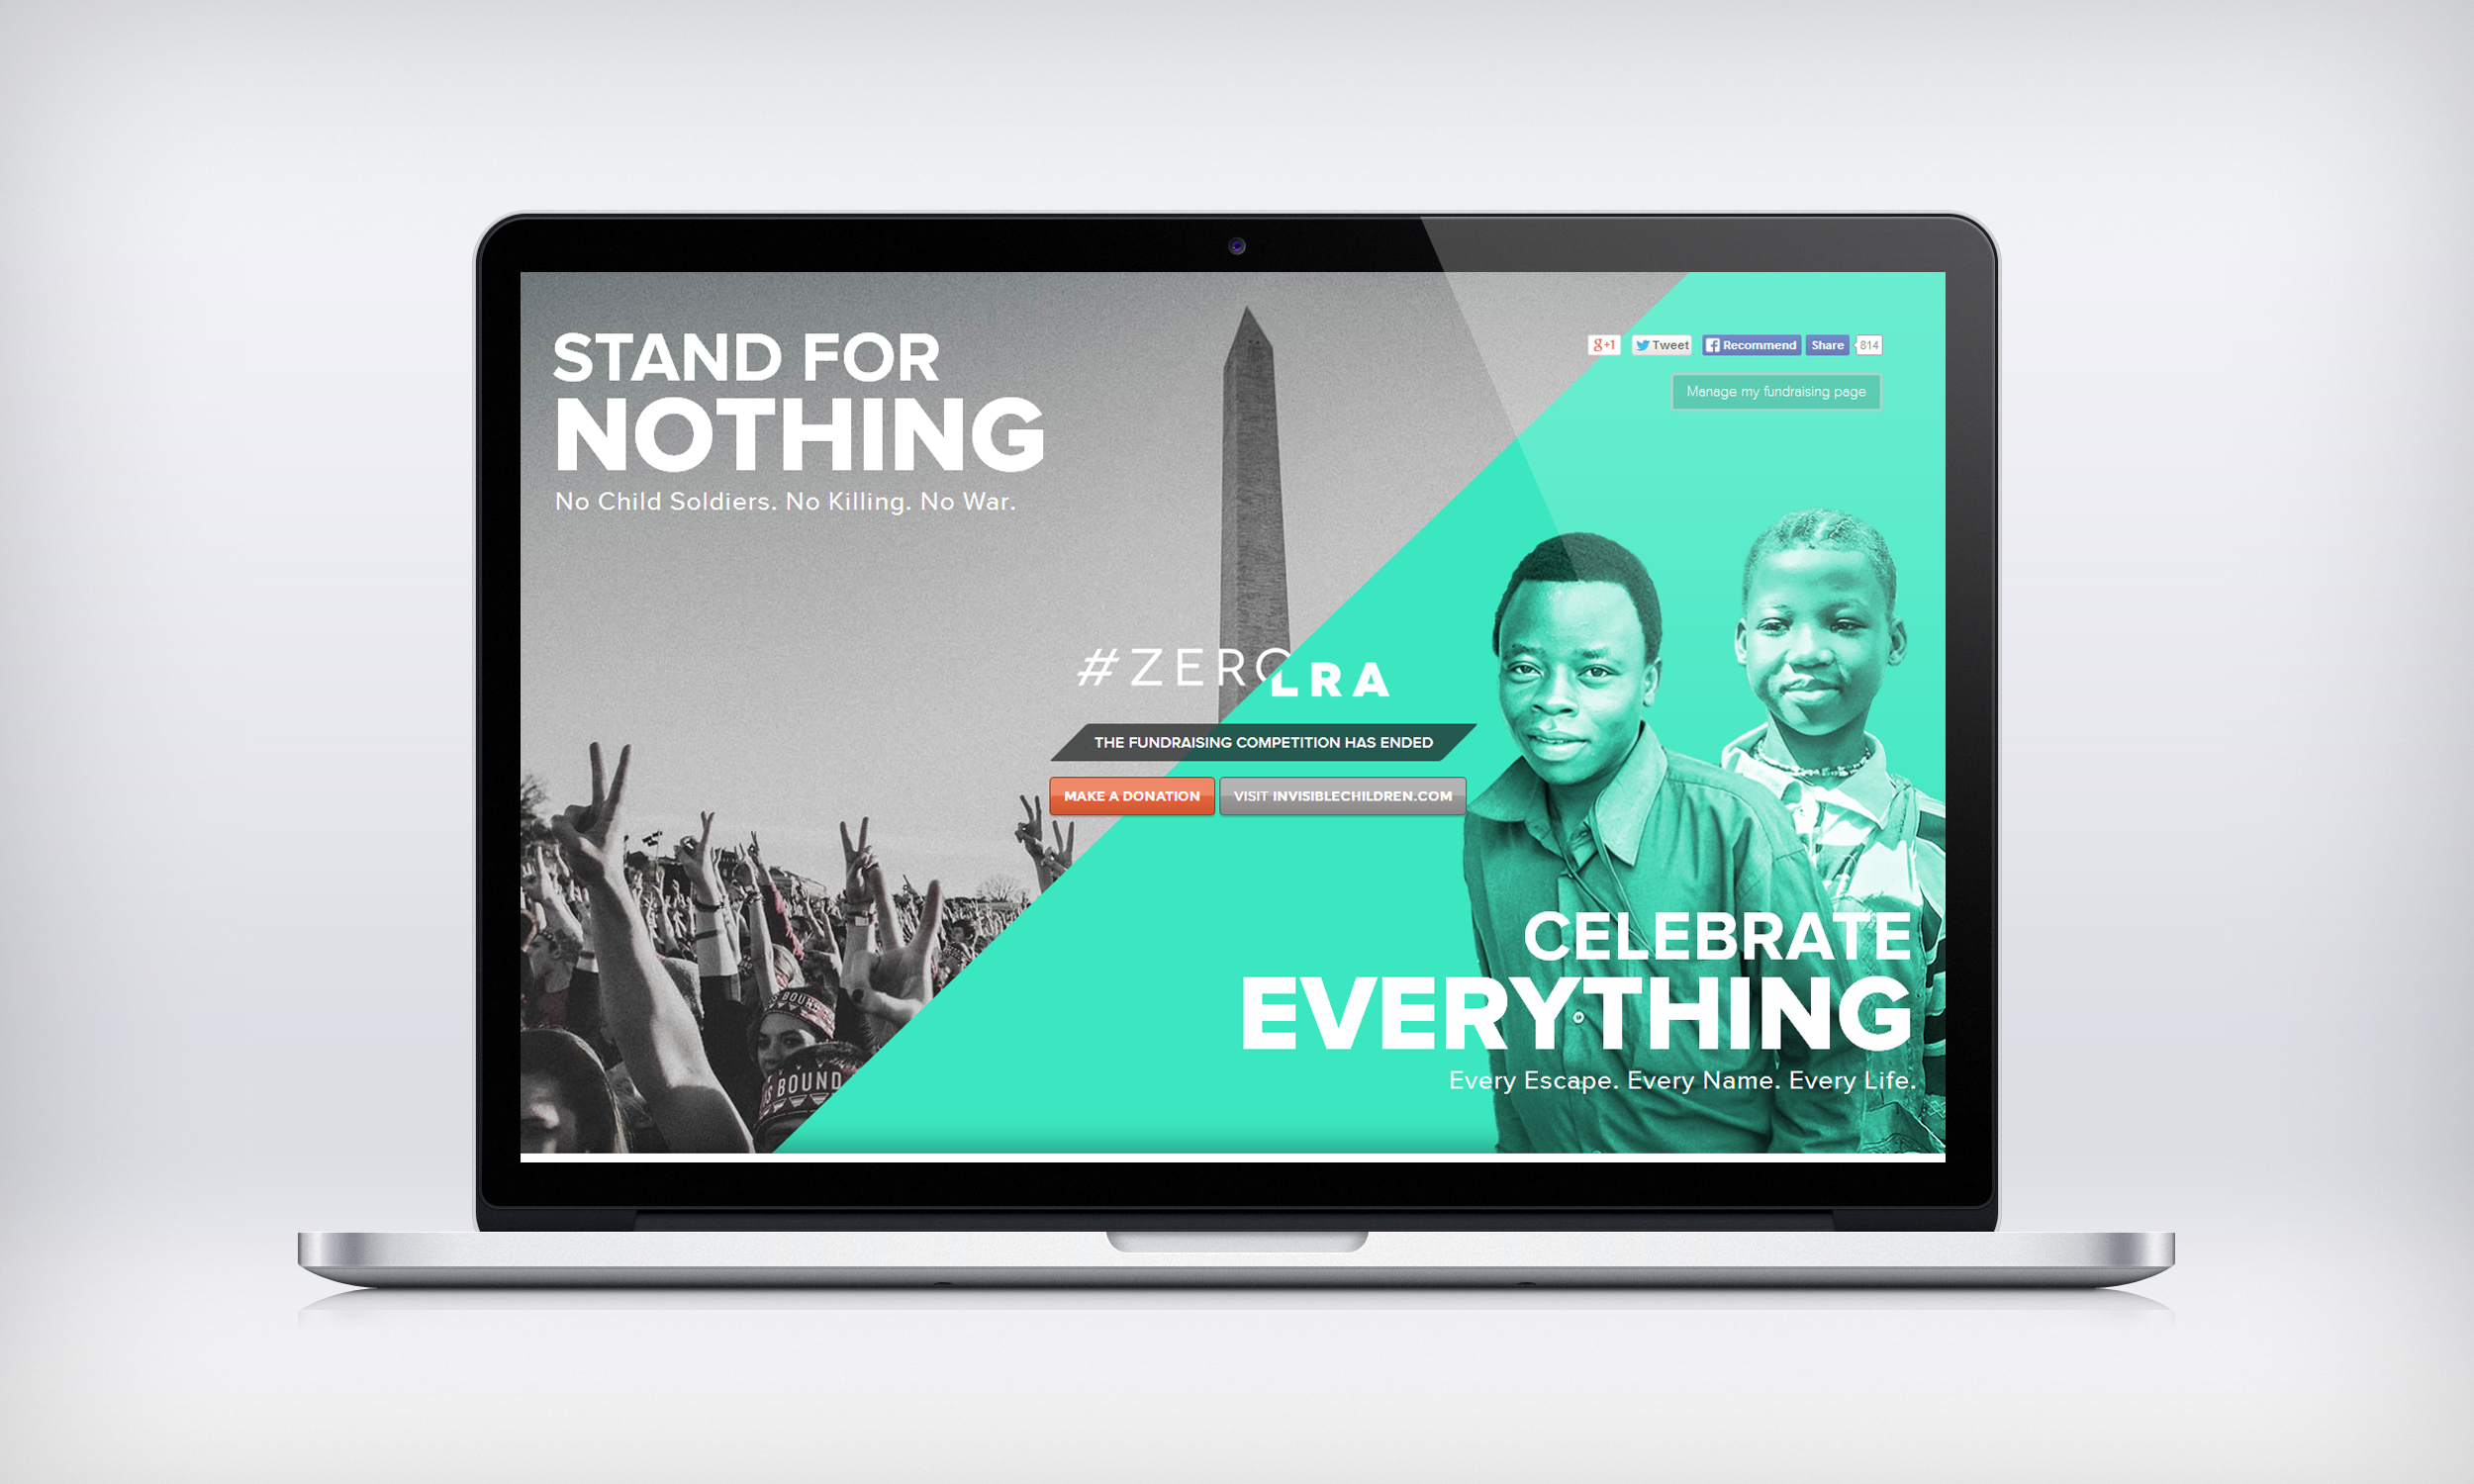 #zeroLRA Fundraising Campaign